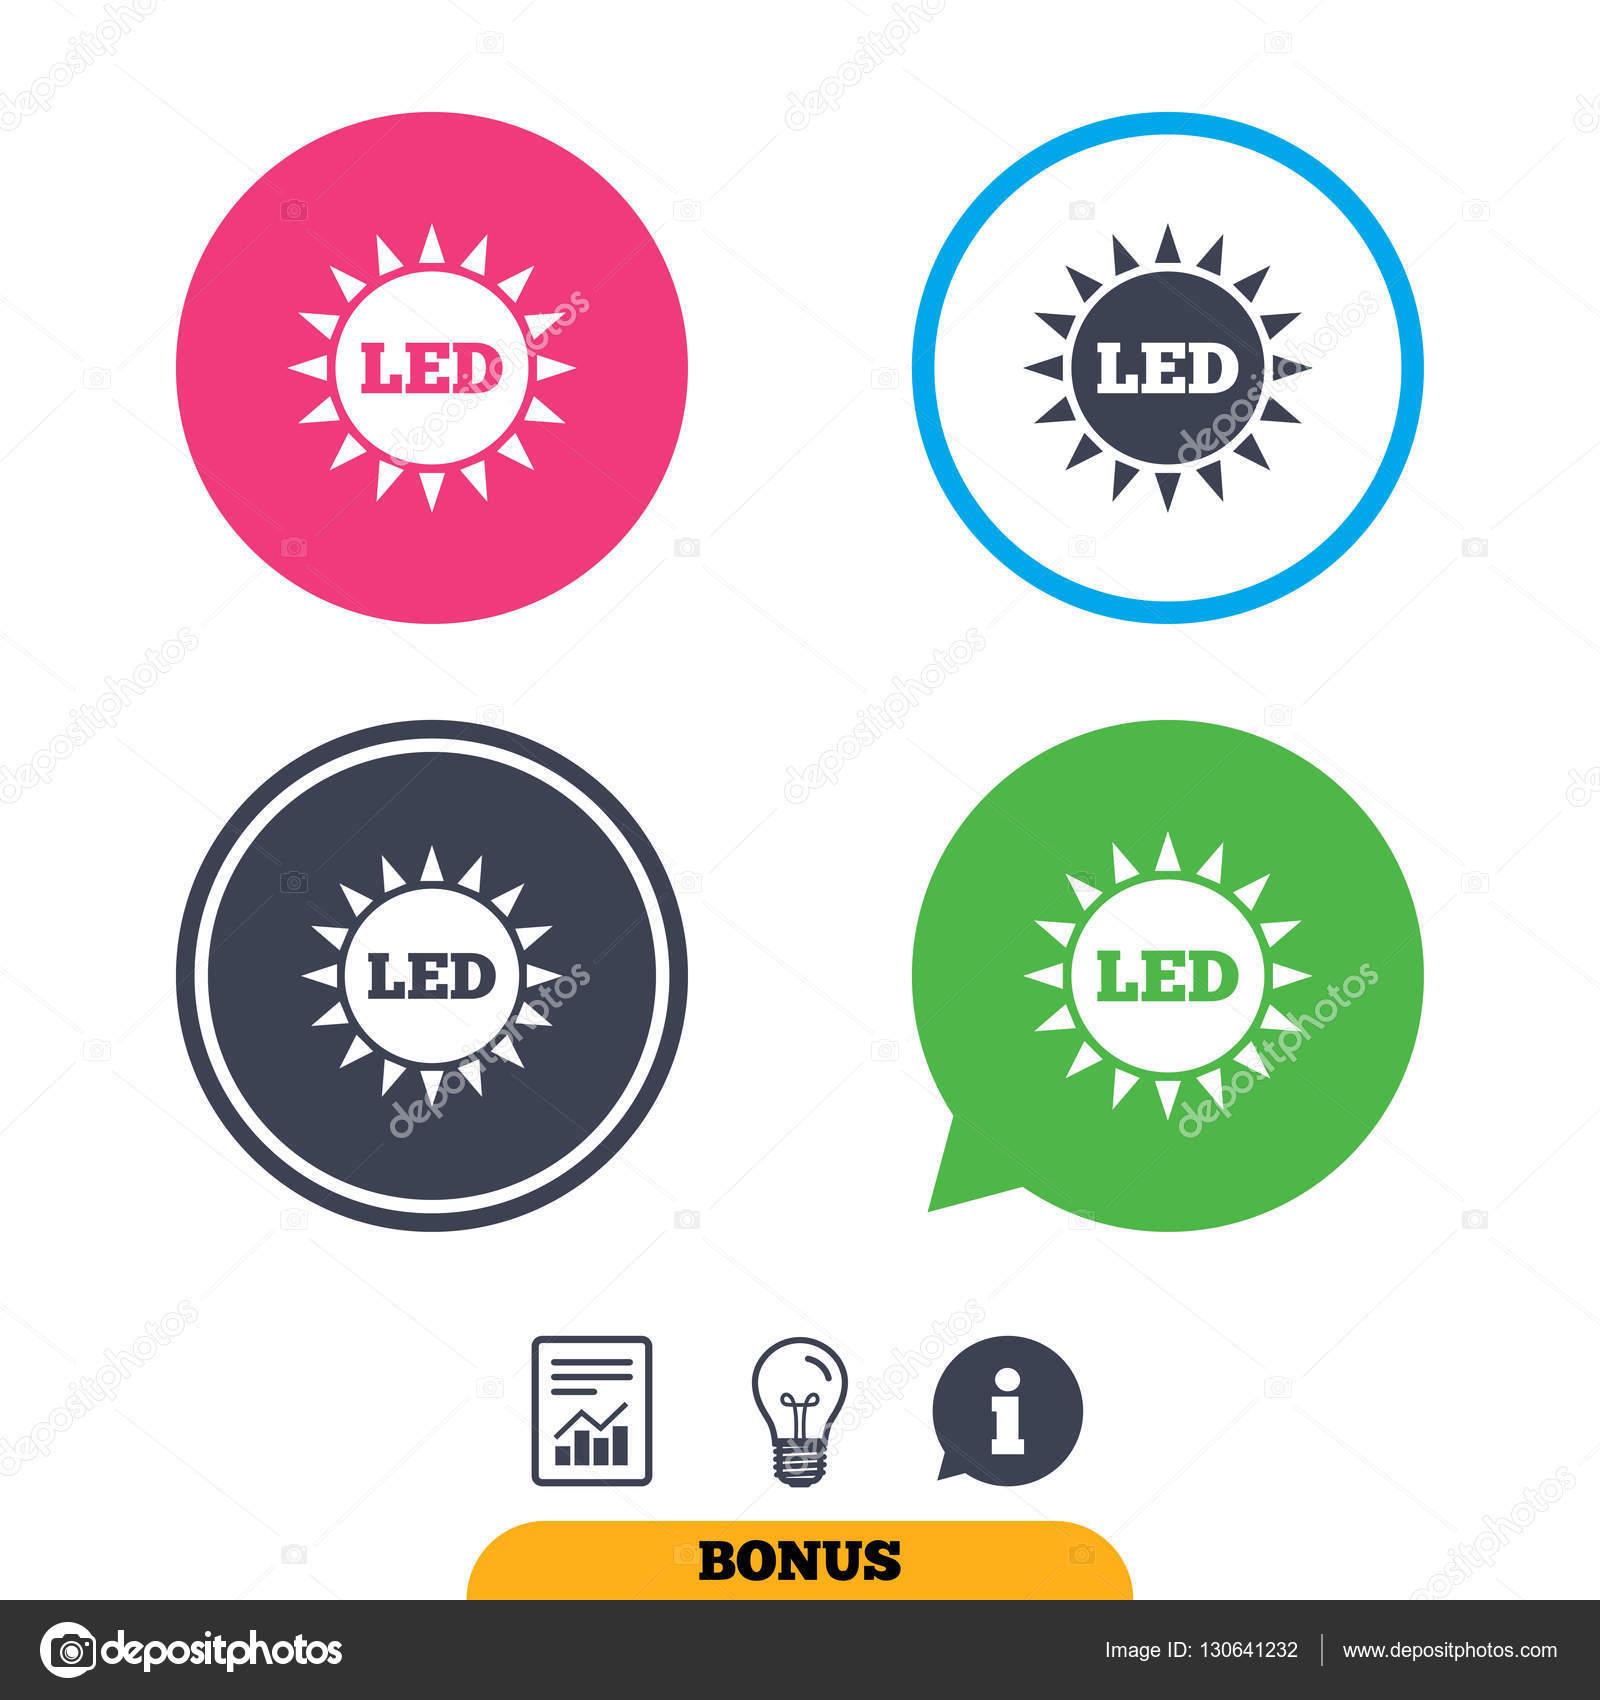 Led light icons — Stock Vector © Blankstock #130641232